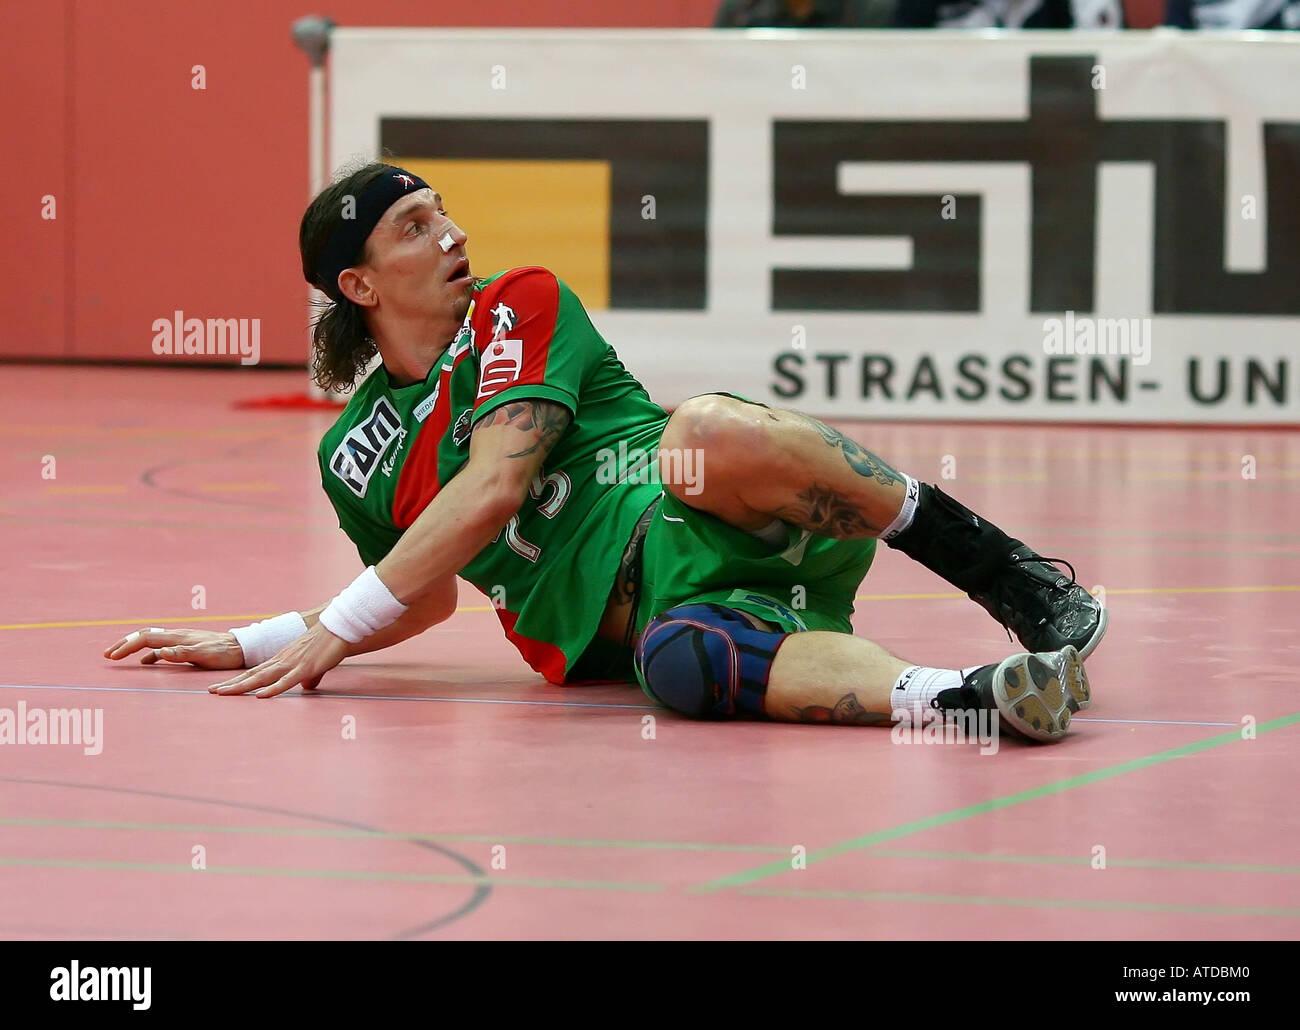 Stefan Kretzschmar - SC Magdeburg - Stock Image